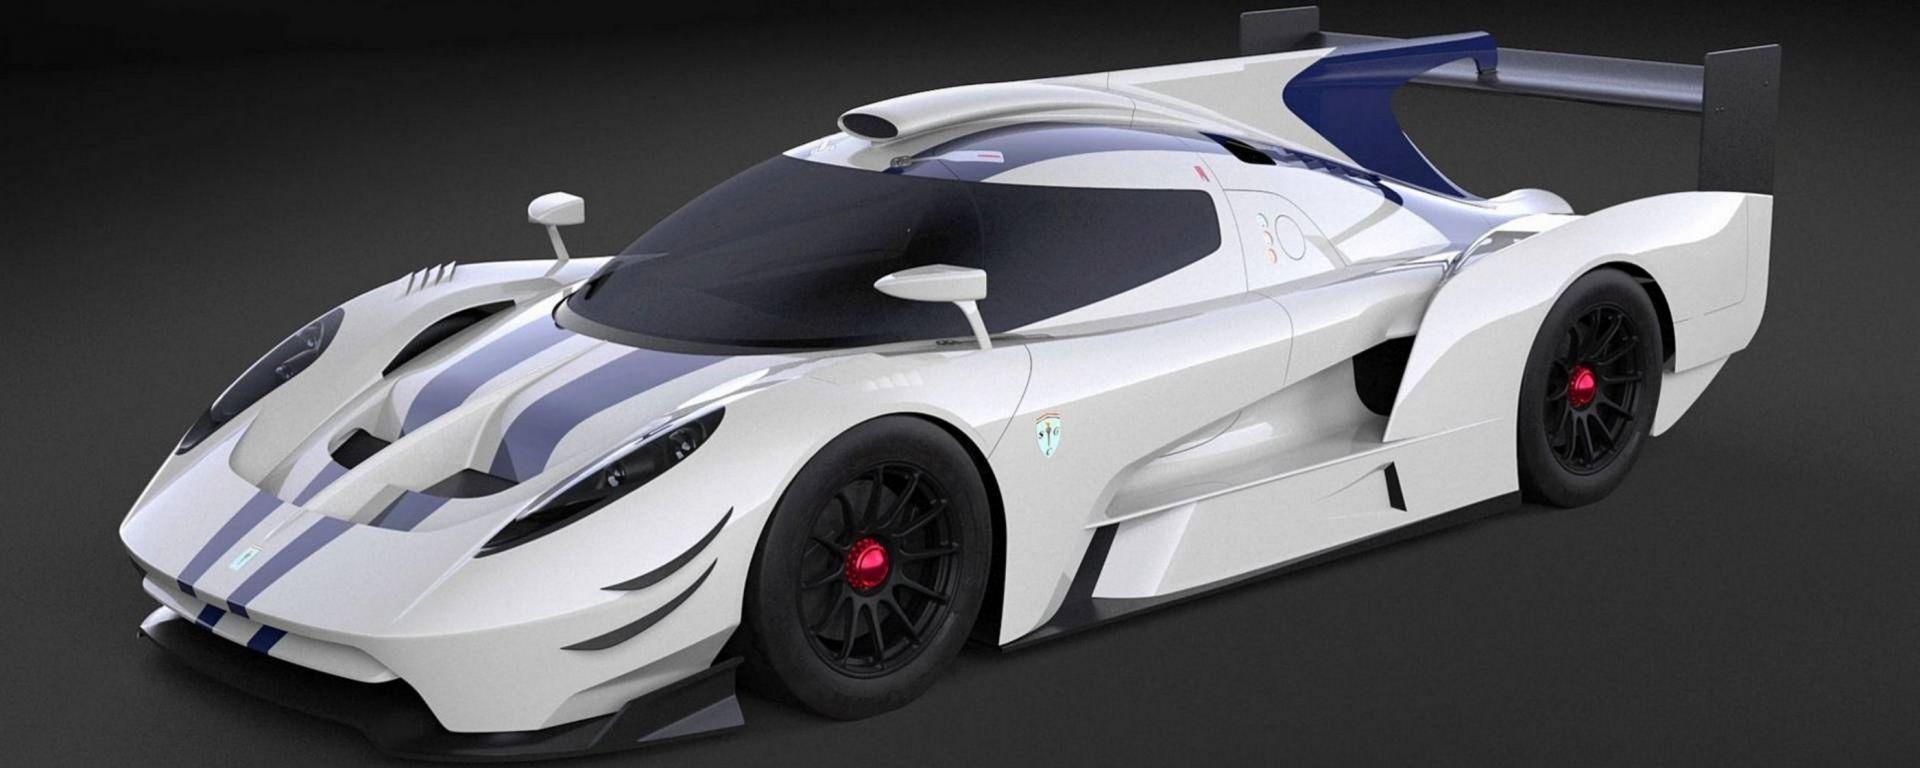 SCG 007 LMP1: ecco la prima supercar per Le Mans 2020